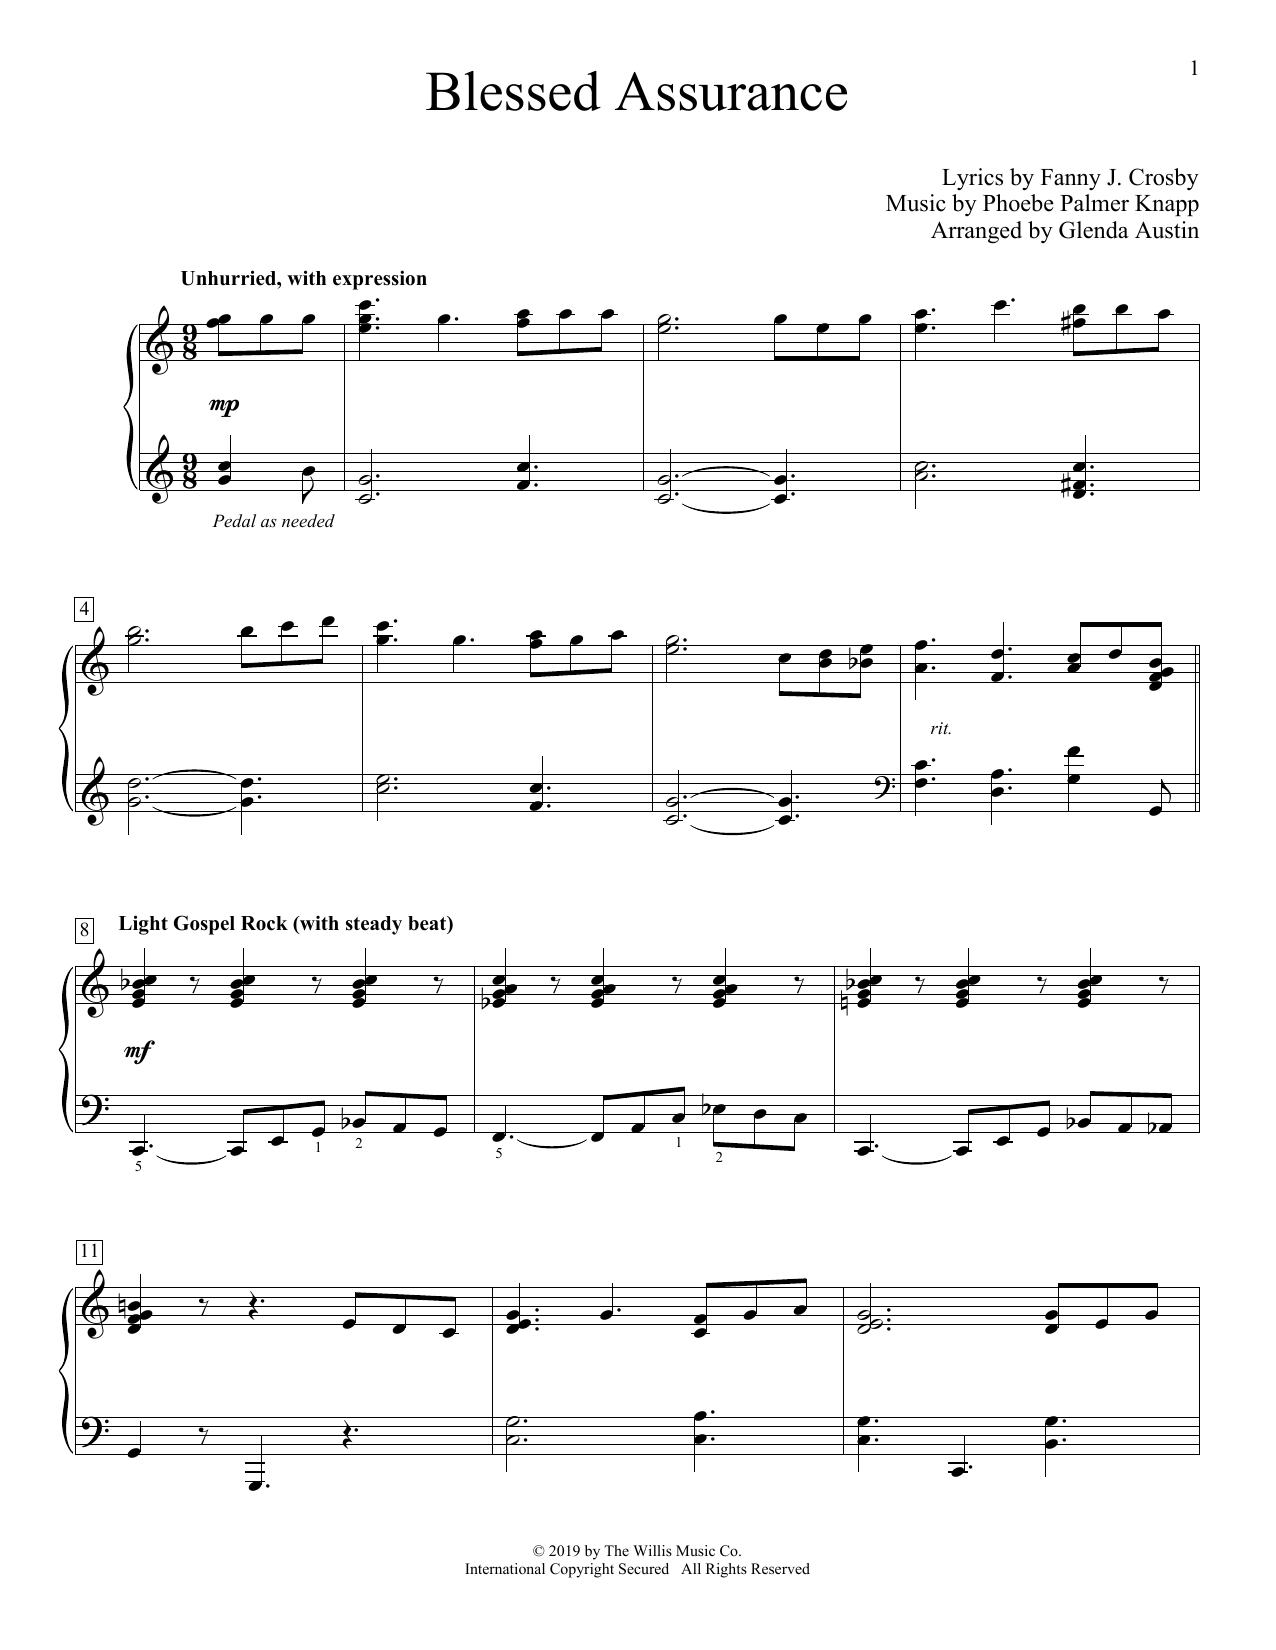 Phoebe Palmer Knapp Blessed Assurance (arr. Glenda Austin) sheet music notes and chords